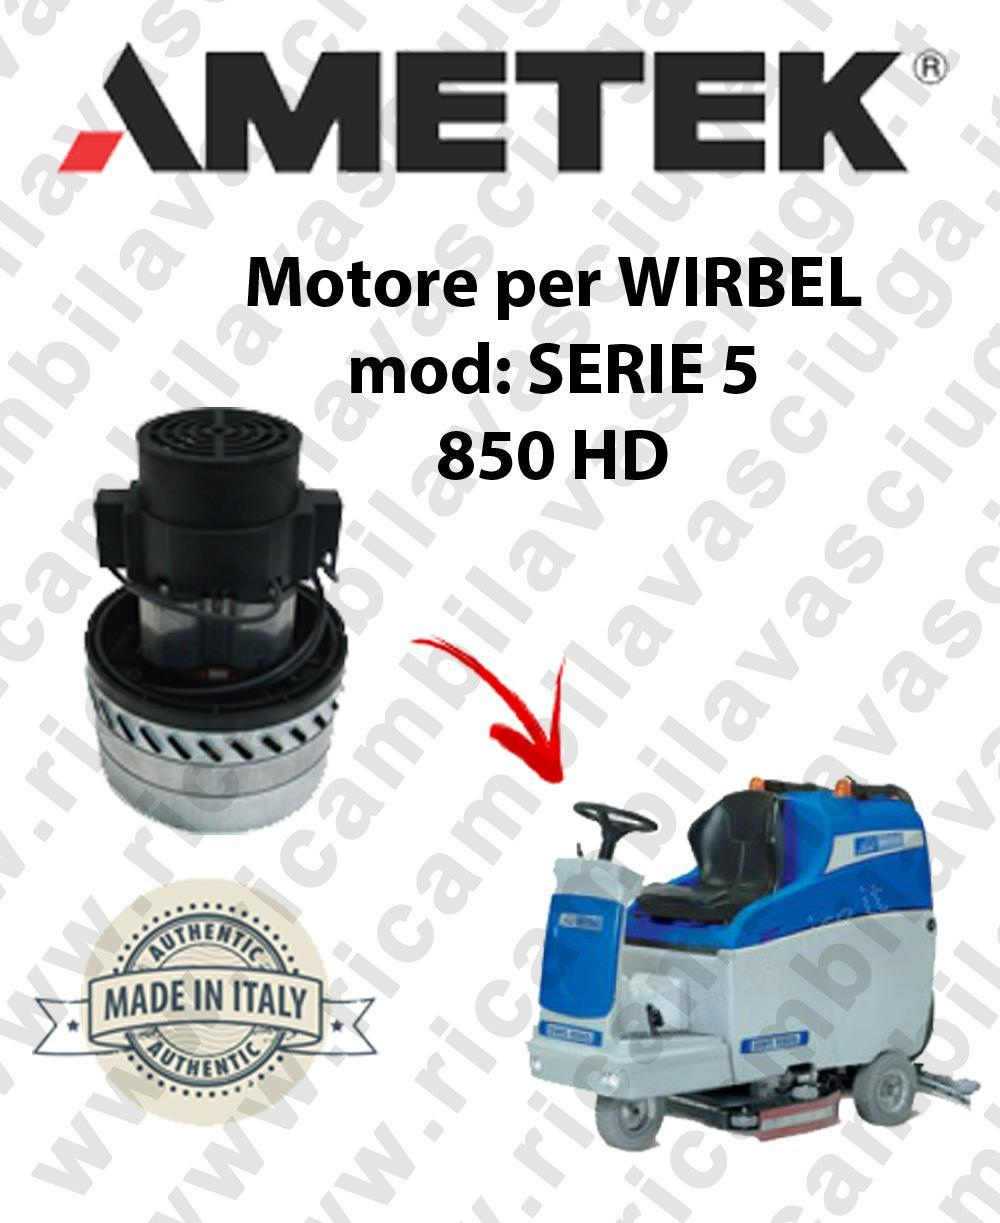 SERIE 5 850 HD Saugmotor AMETEK für scheuersaugmaschinen WIRBEL